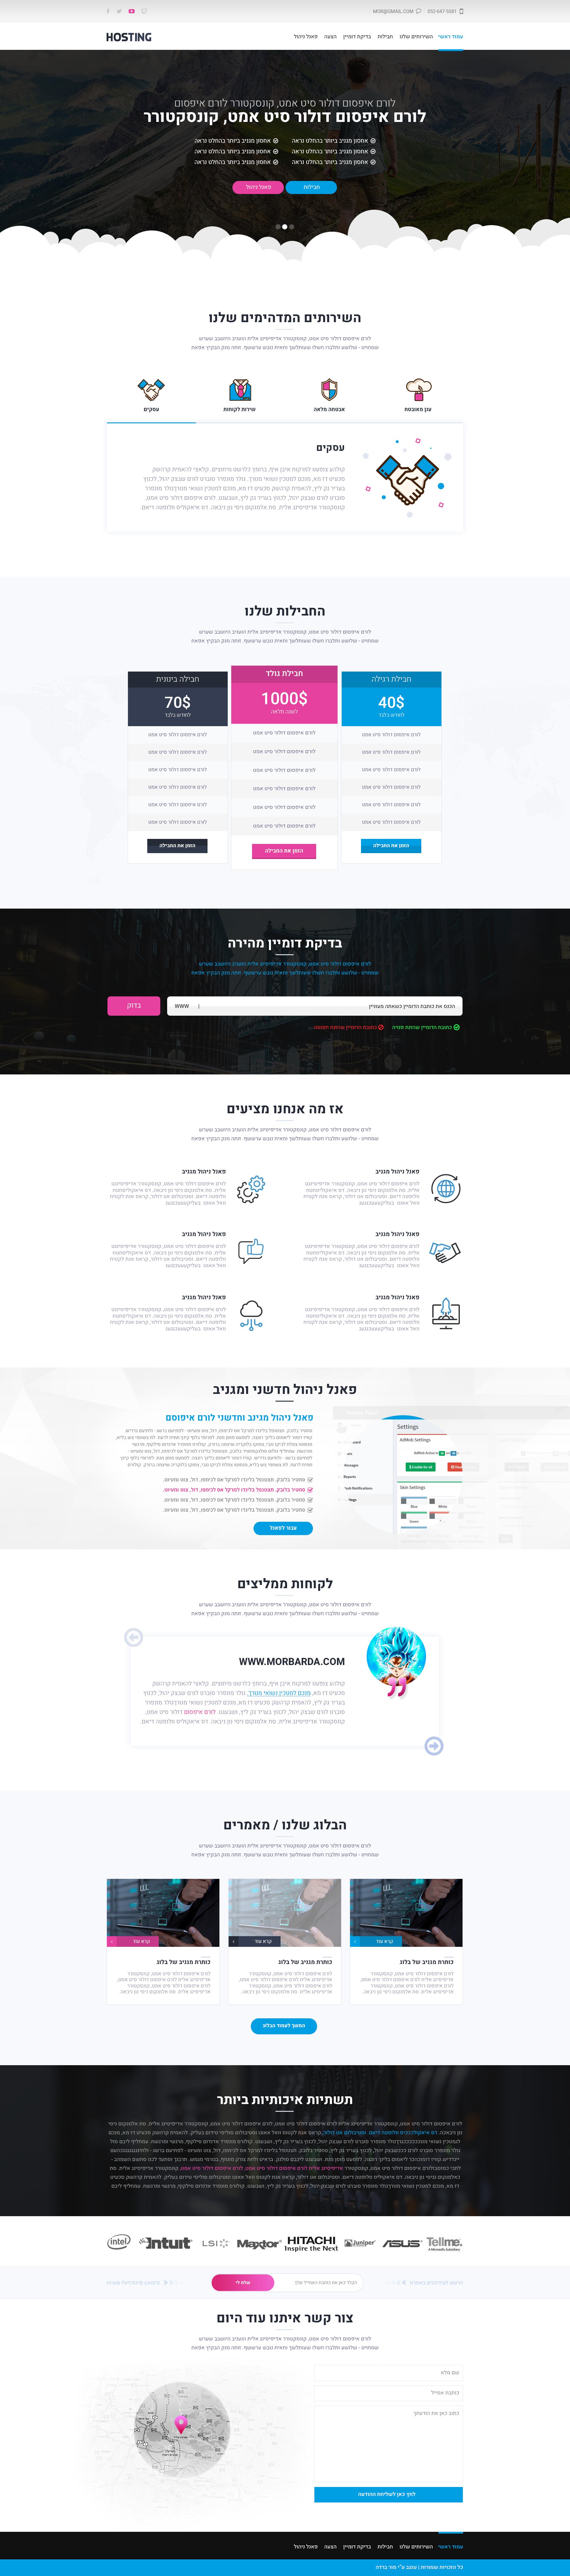 Website Design - For Training - MorBarda by MorBarda